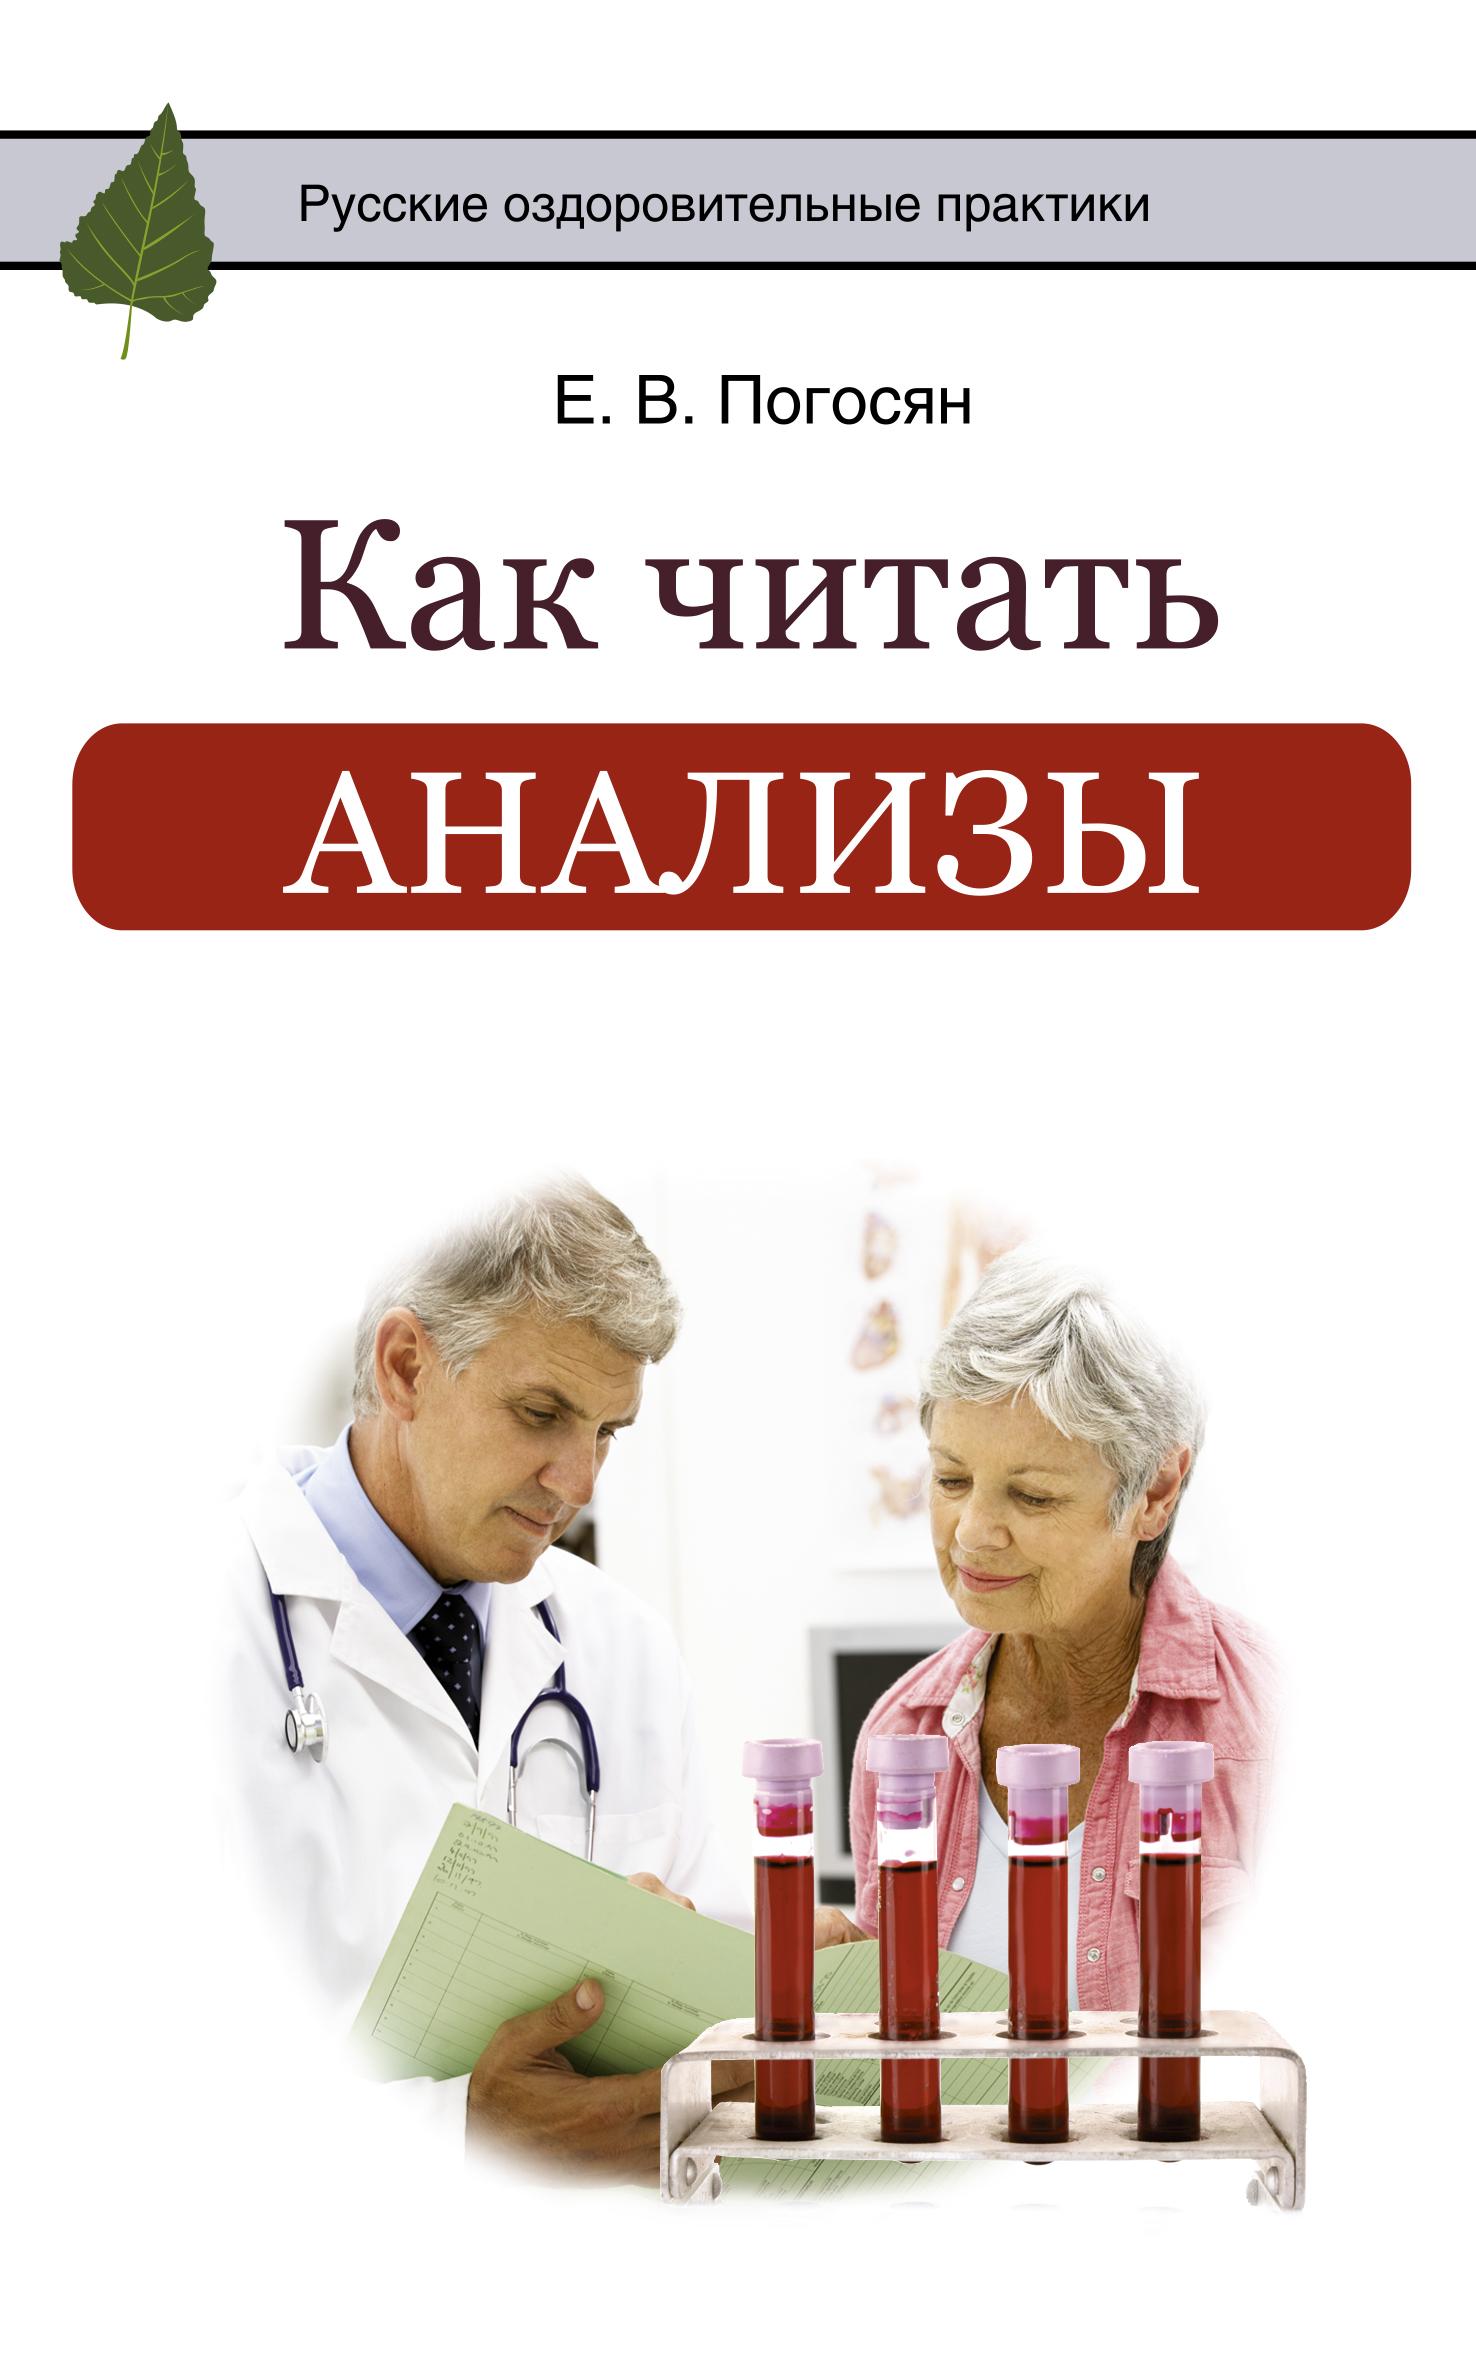 Как читать анализы ( Погосян Е.В.  )